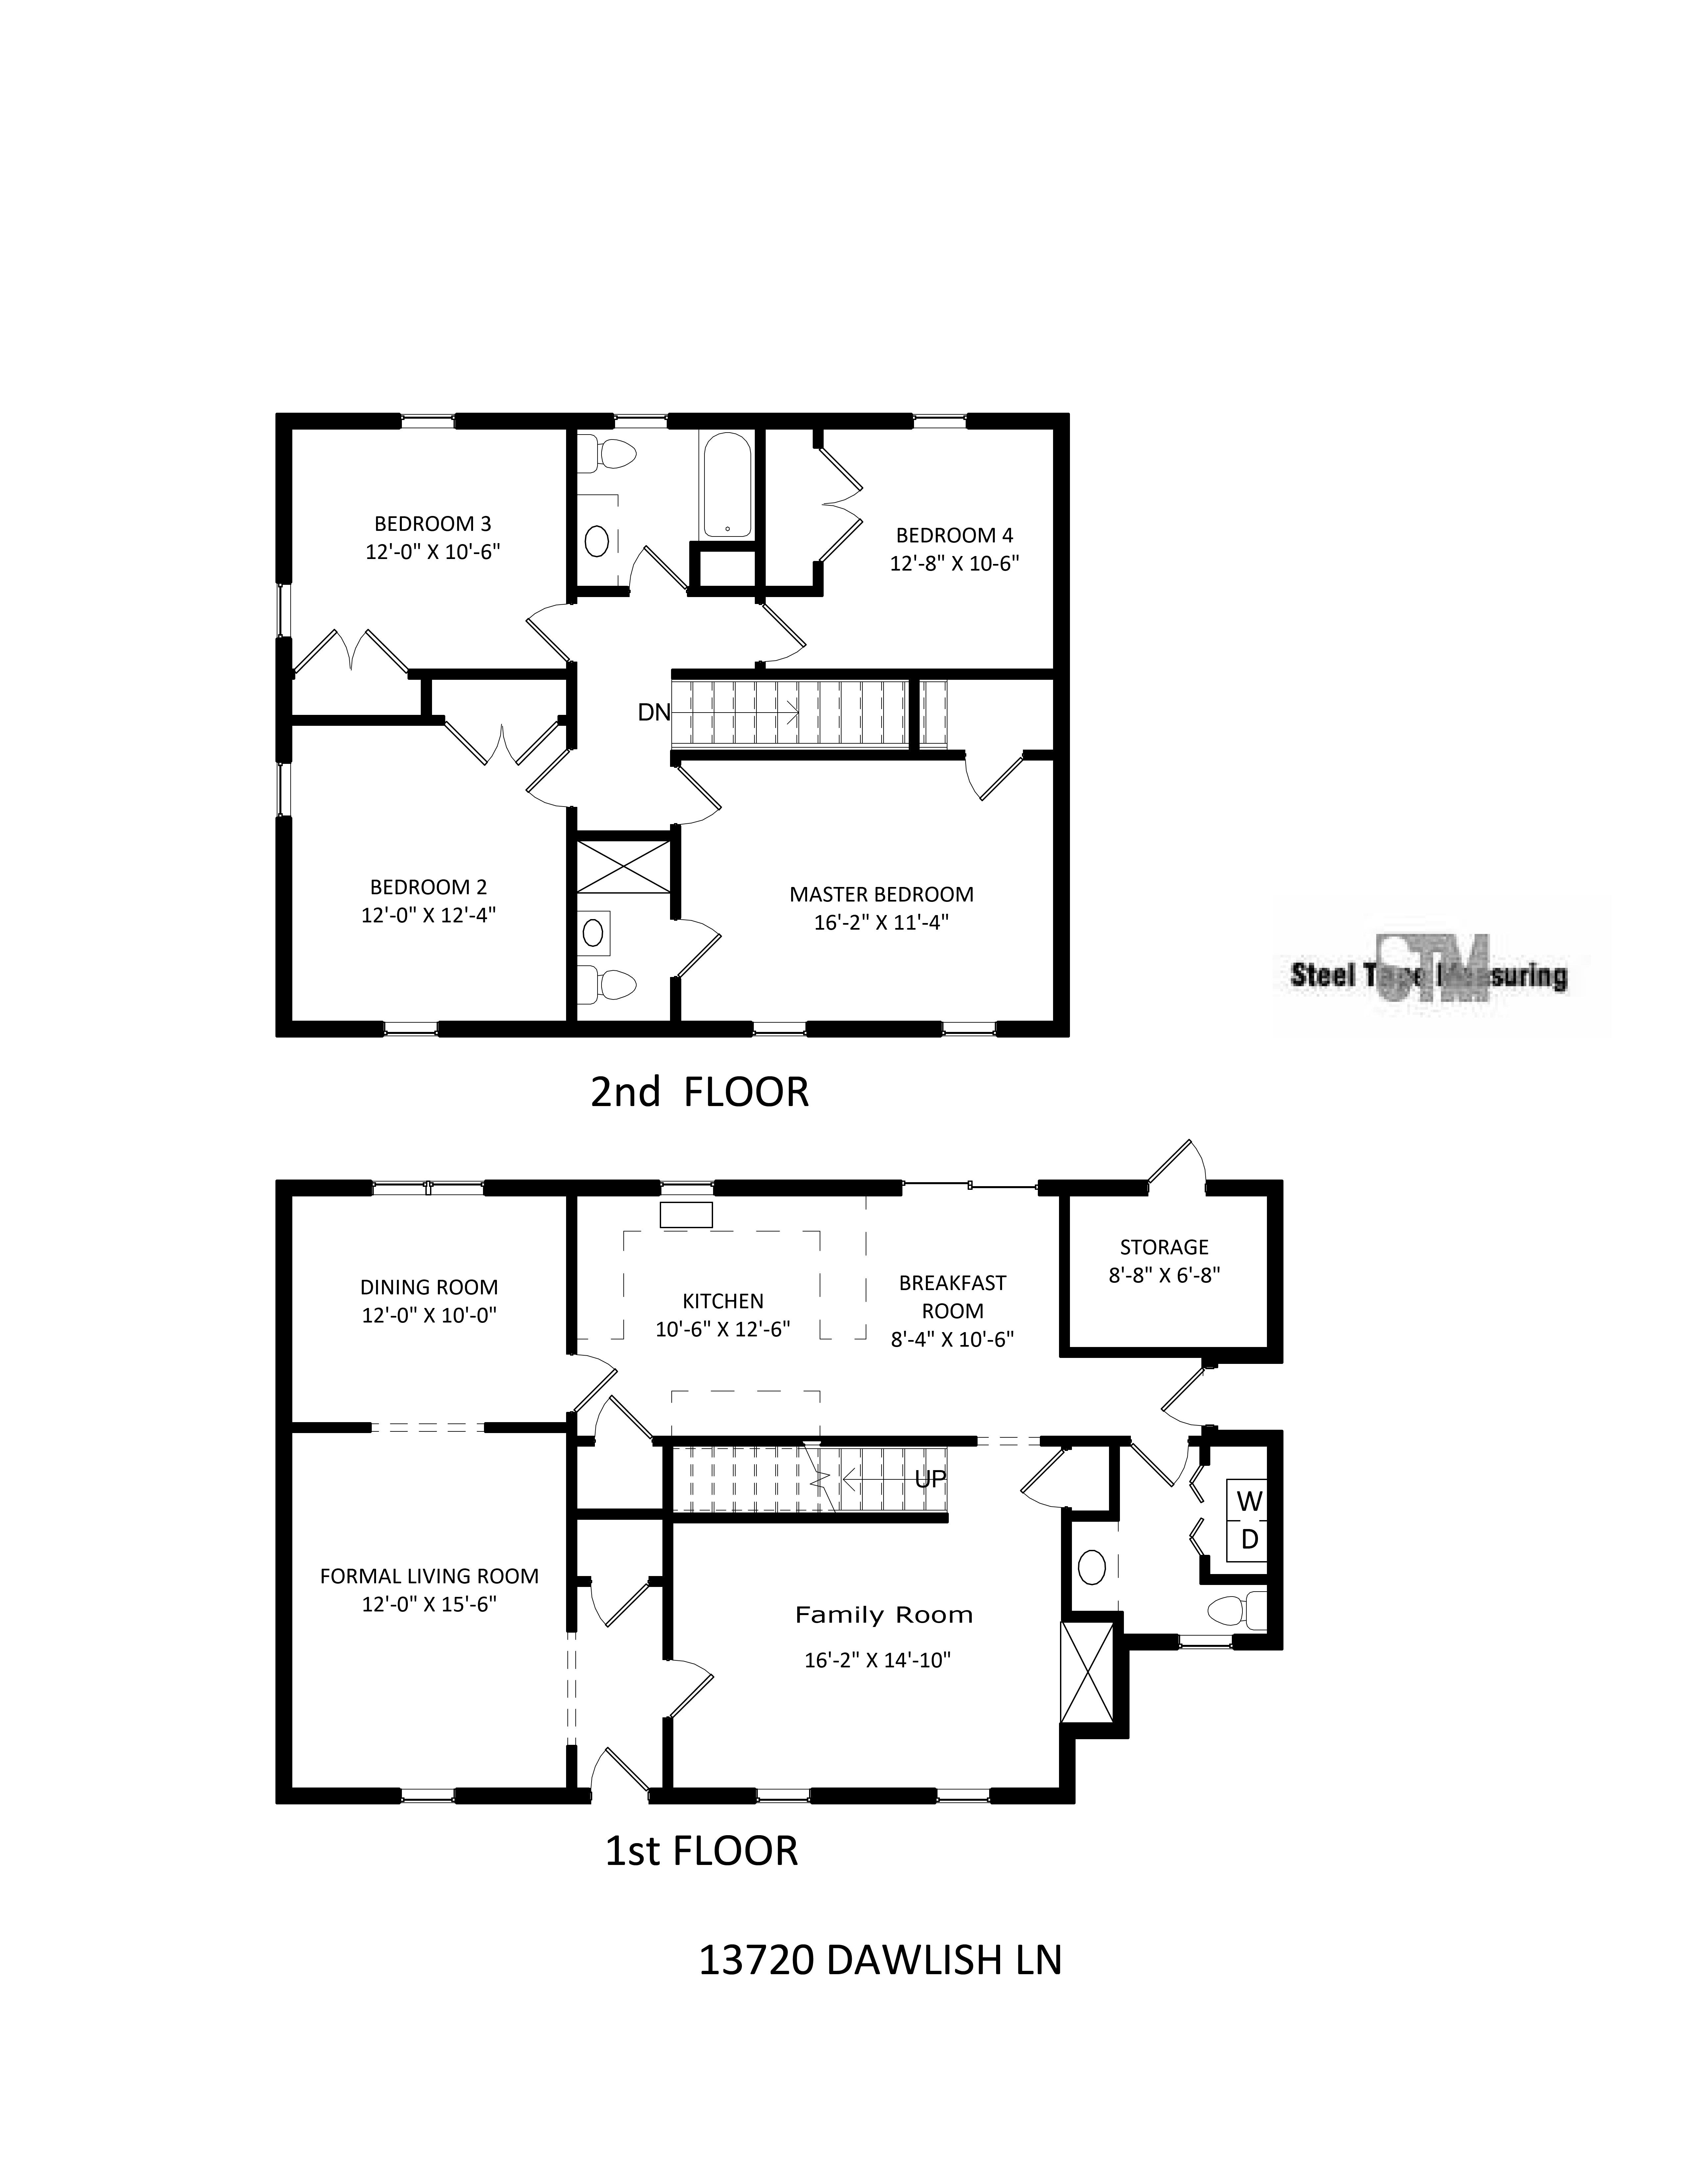 Floor Plan 13720 Dawlish Lane In Pineville's Danby neighborhood